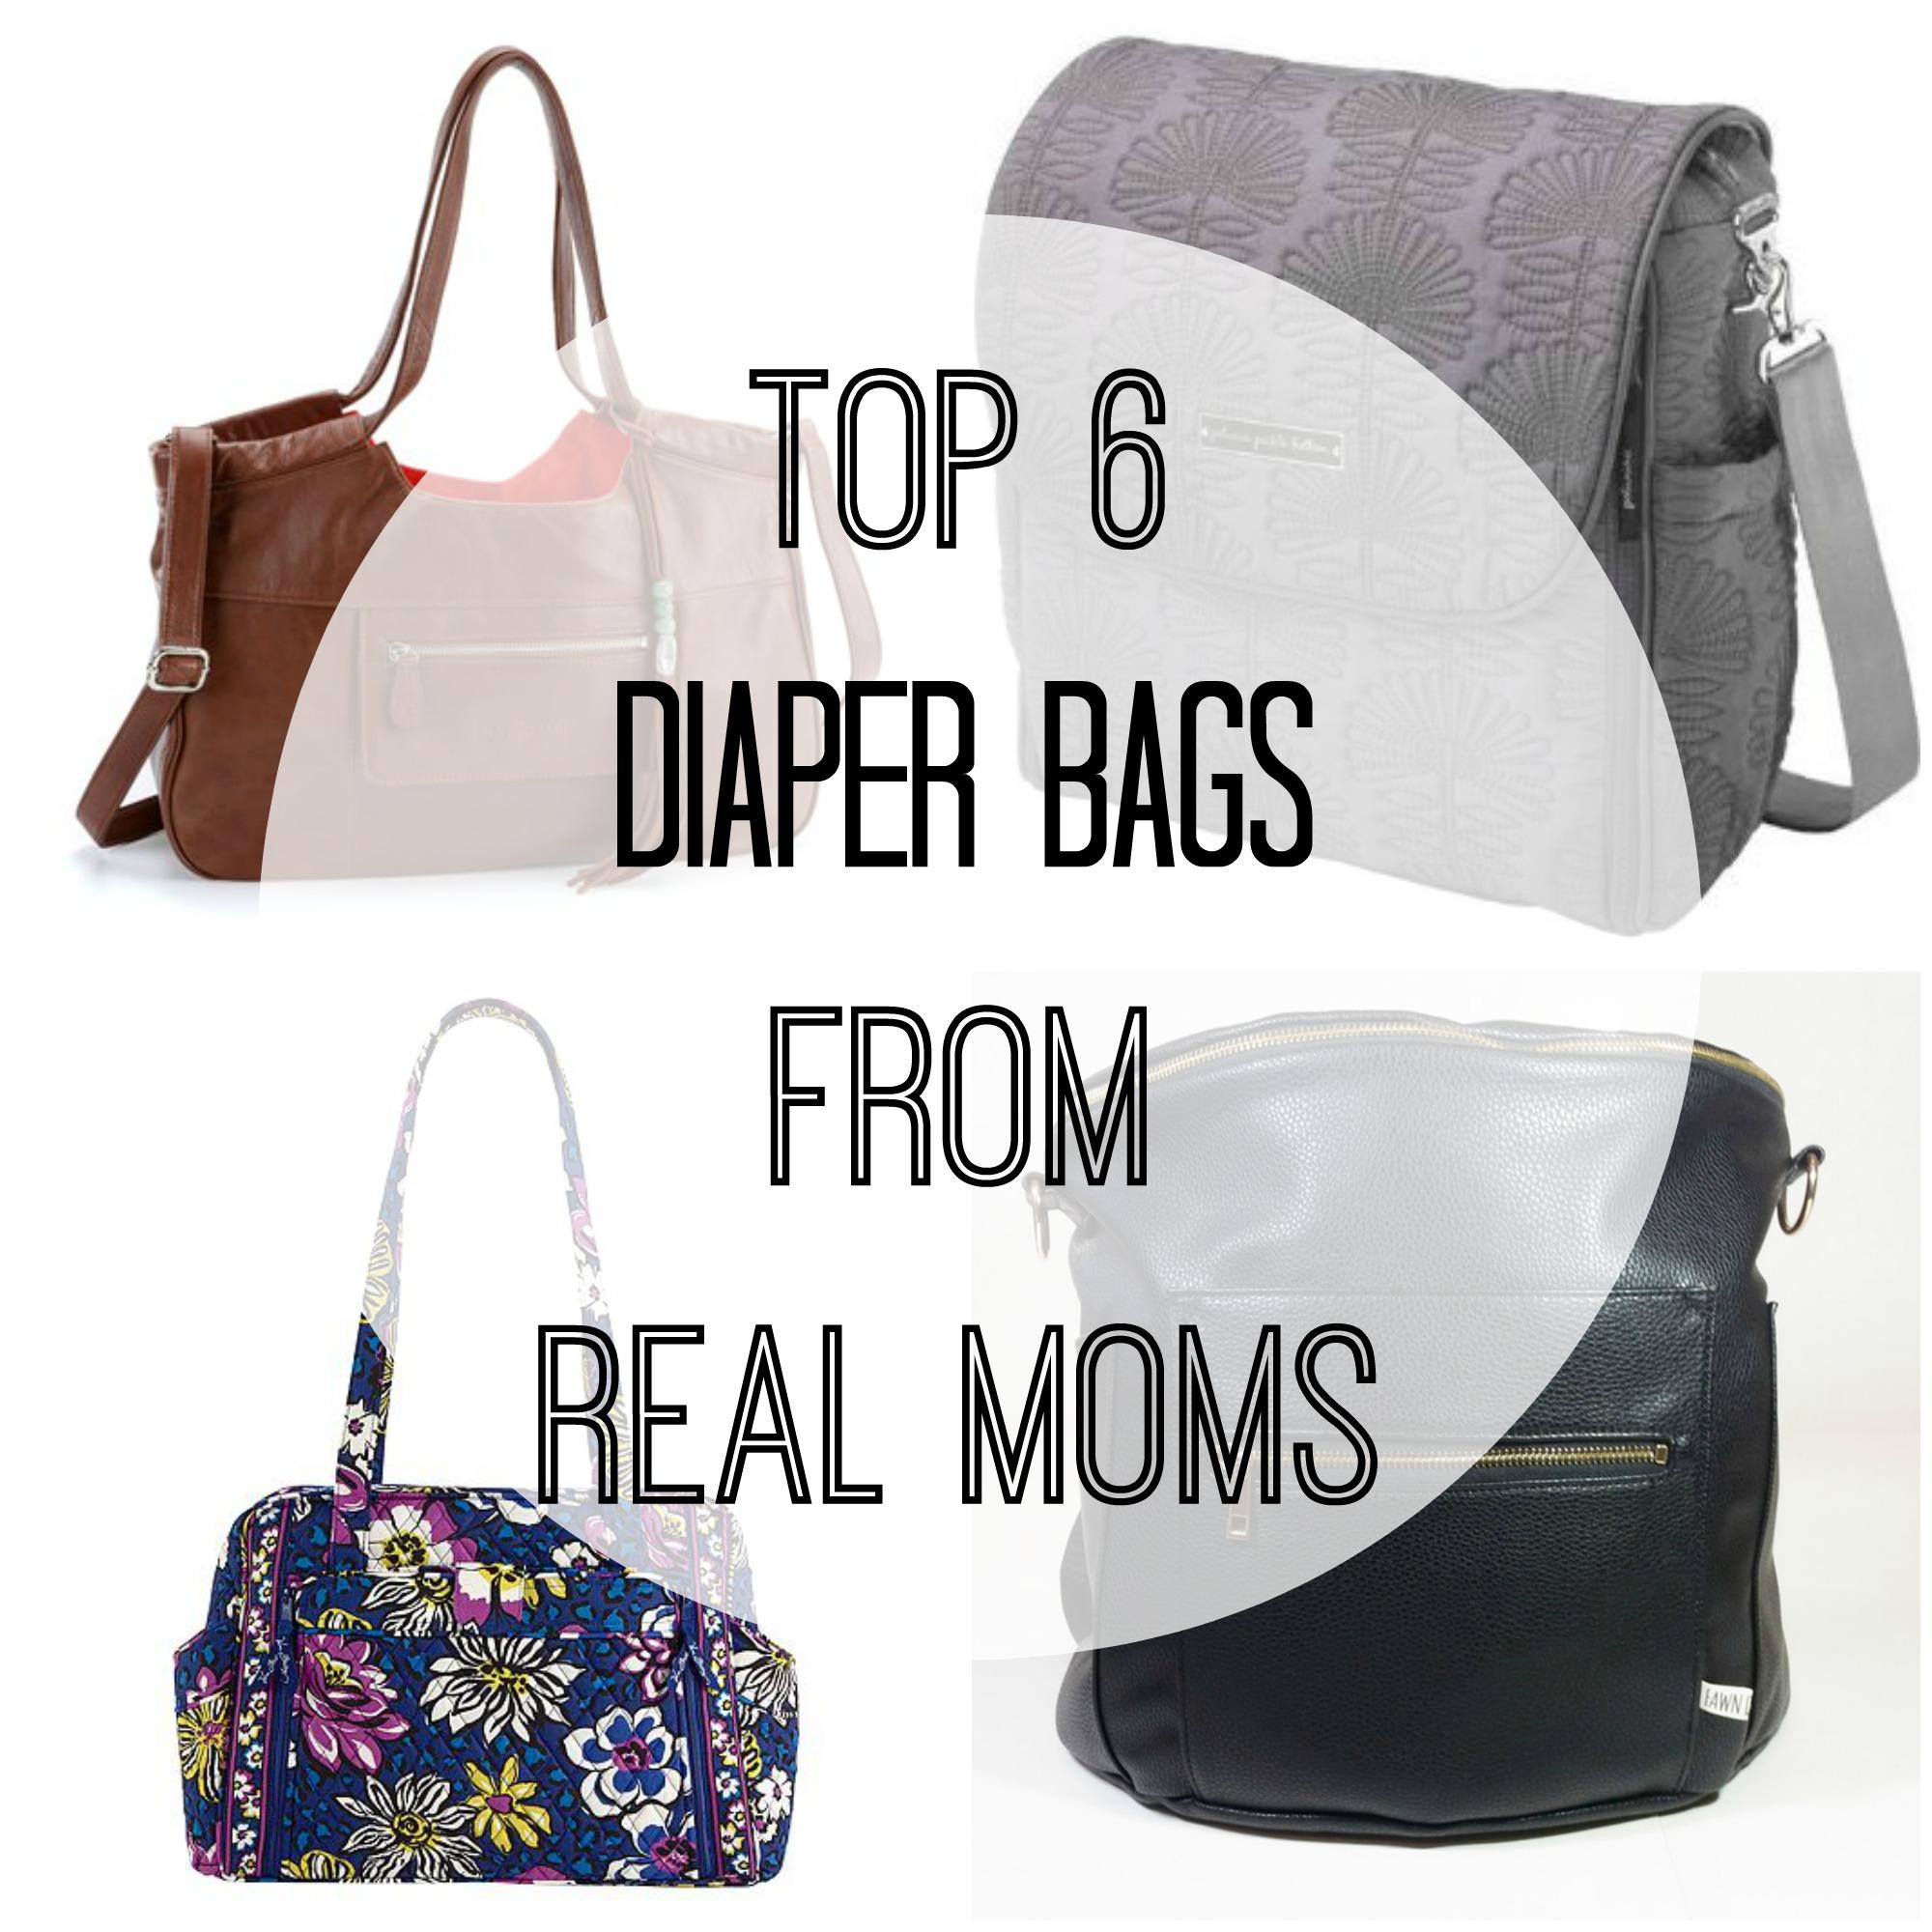 Top 6 Diaper Bags from Real Moms